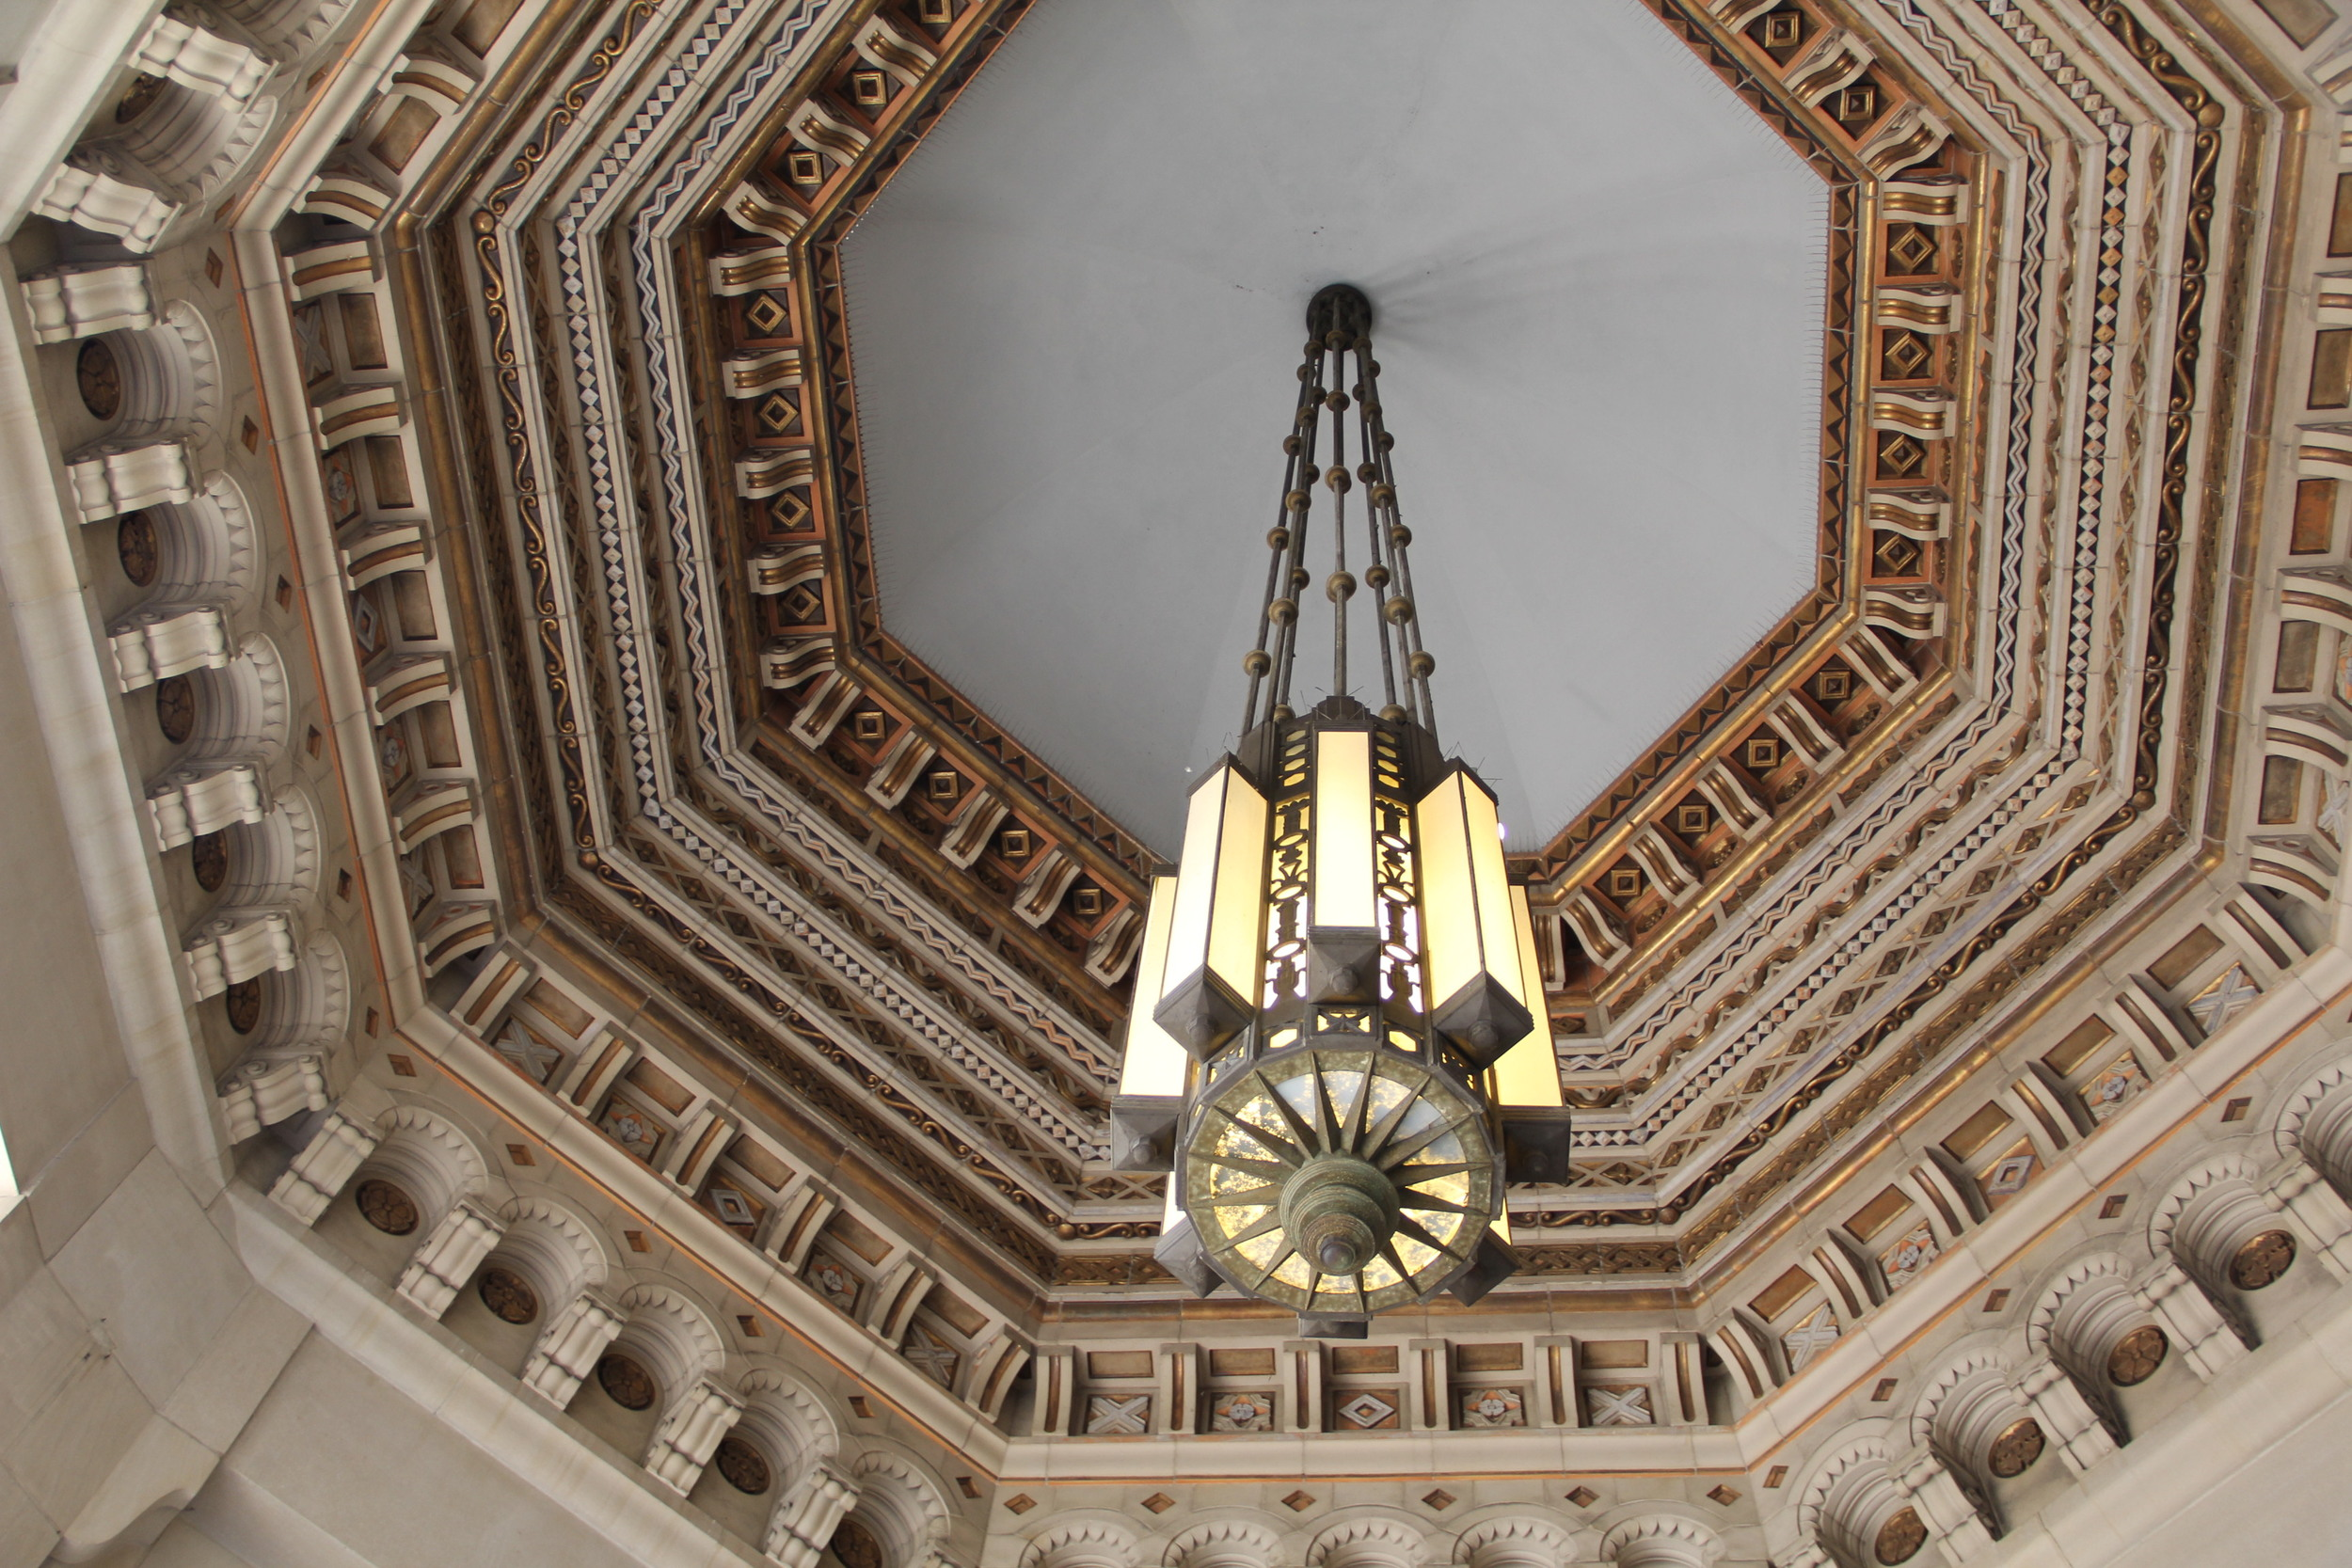 One Bunker Hill Art Deco Lobby Chandelier - Image courtesy:   dtlaexplorer.wordpress.com